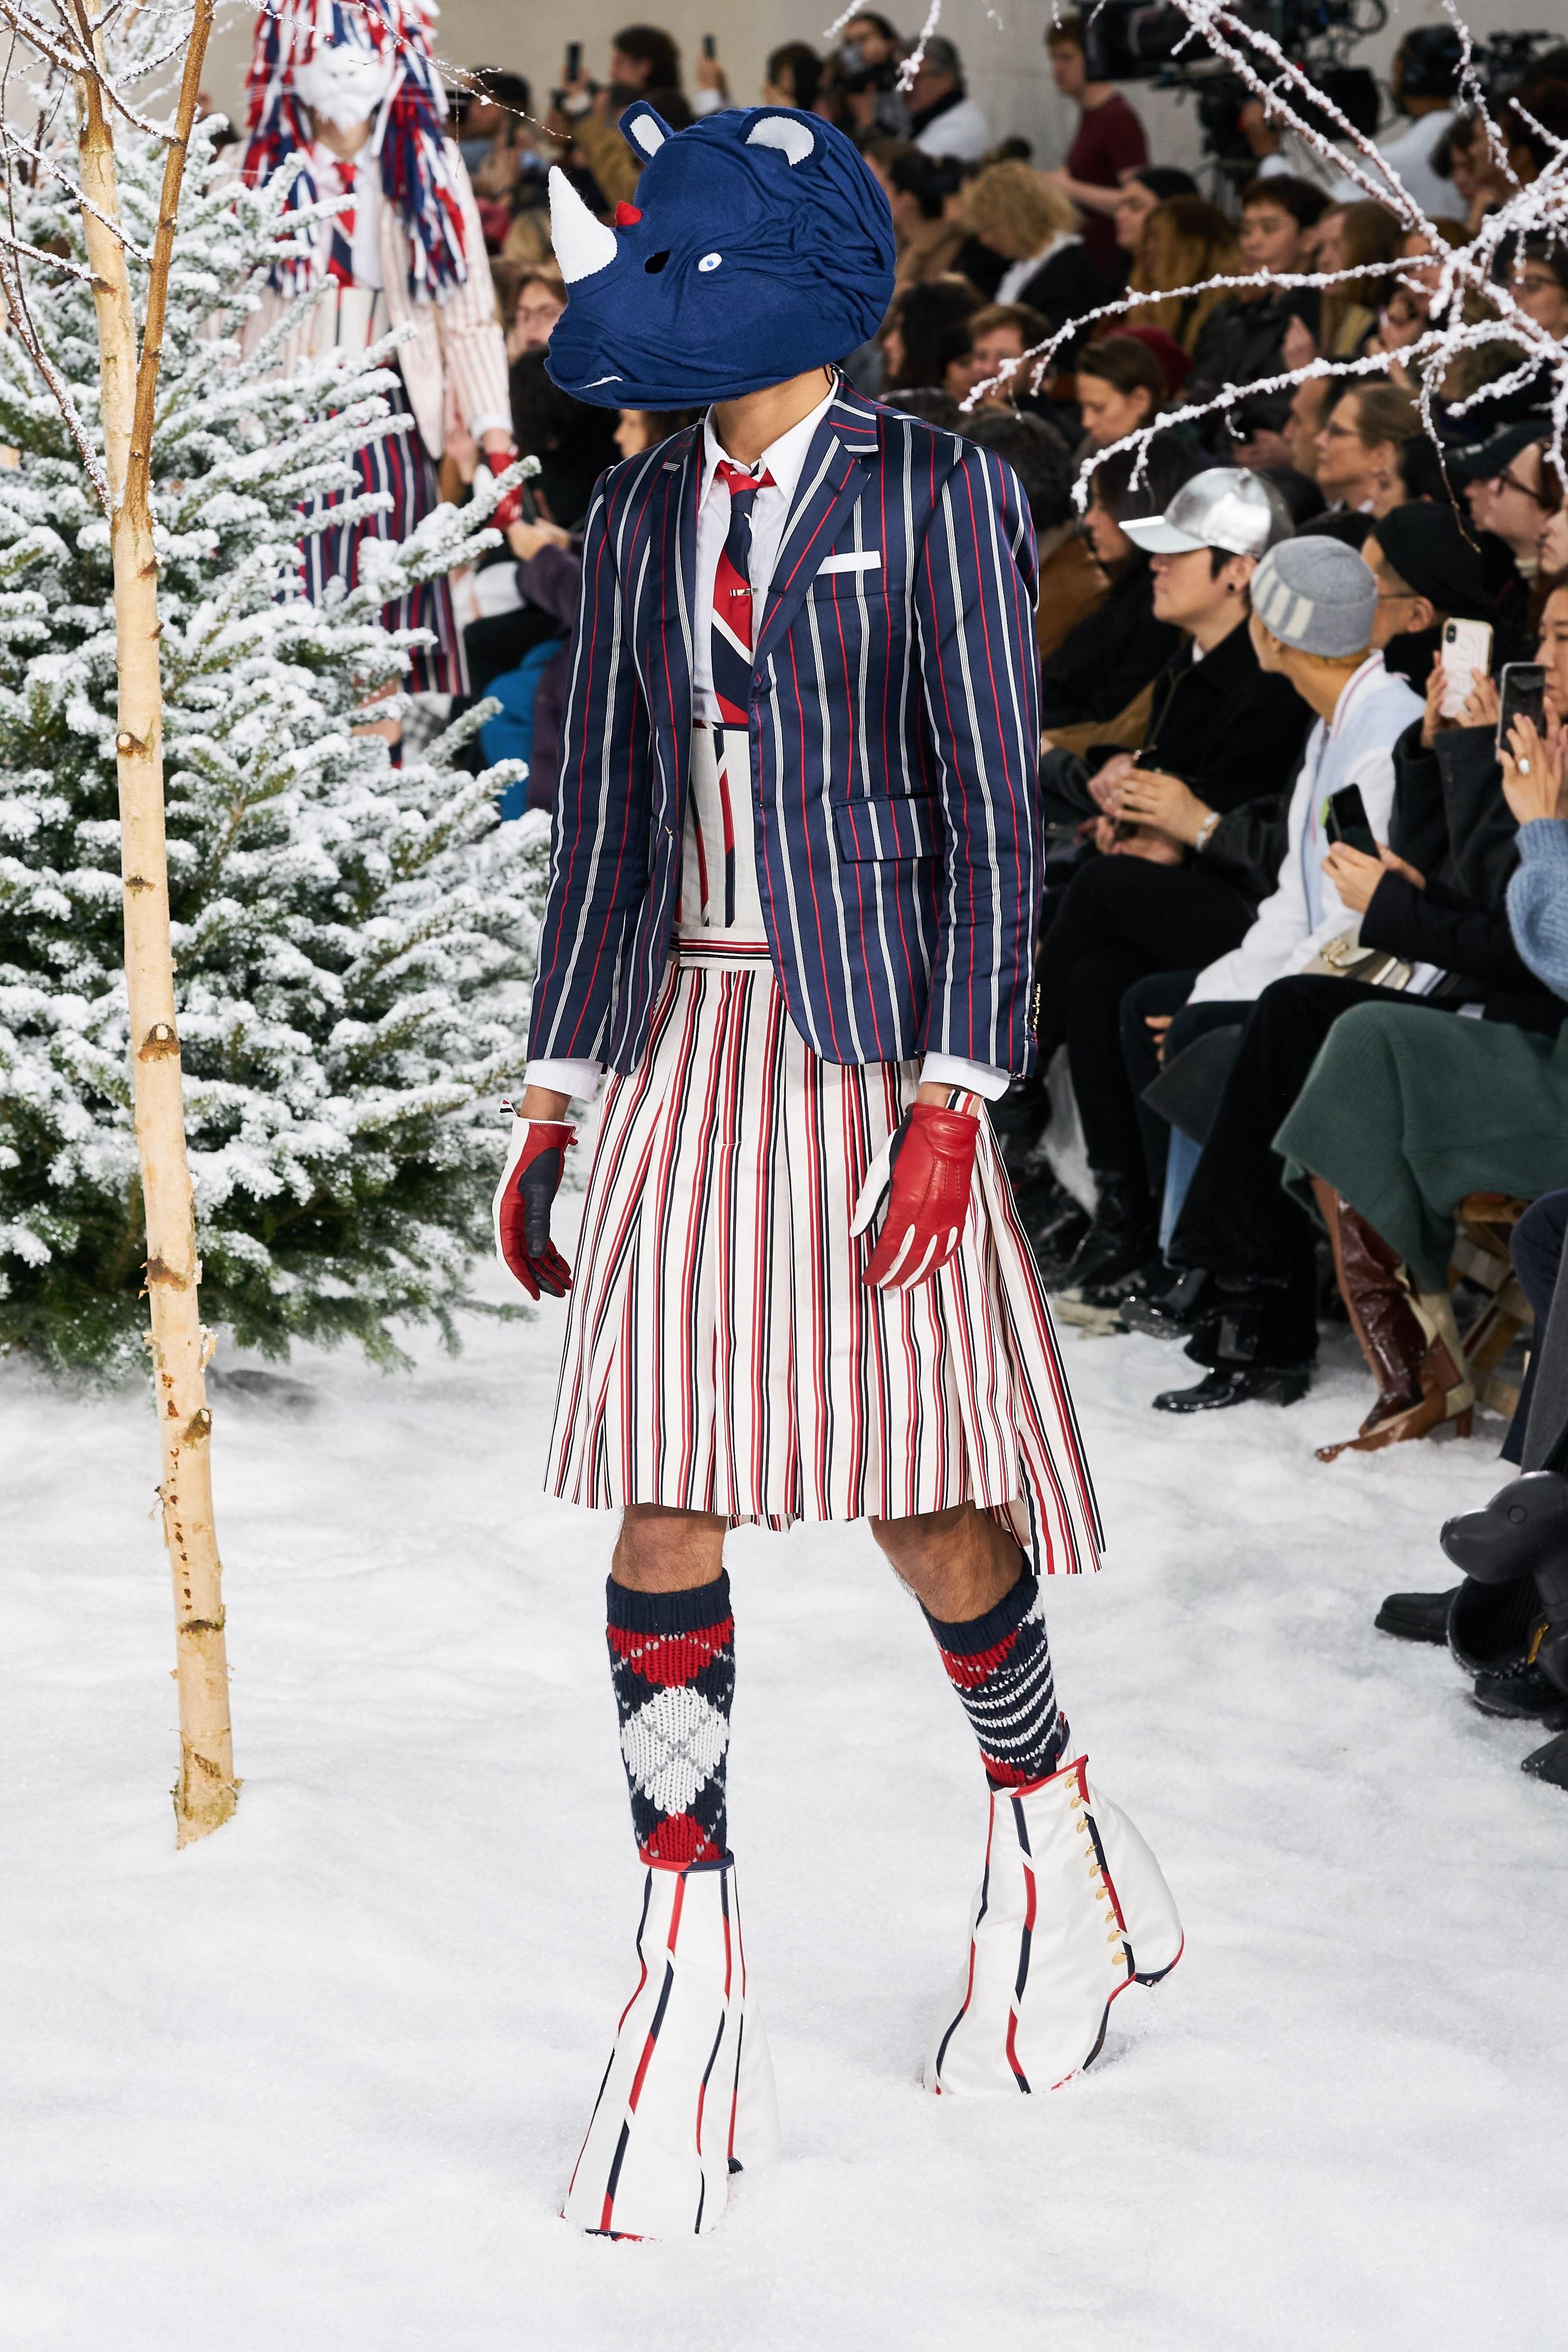 Paris Fashion Week 2020 FW Thom Browne